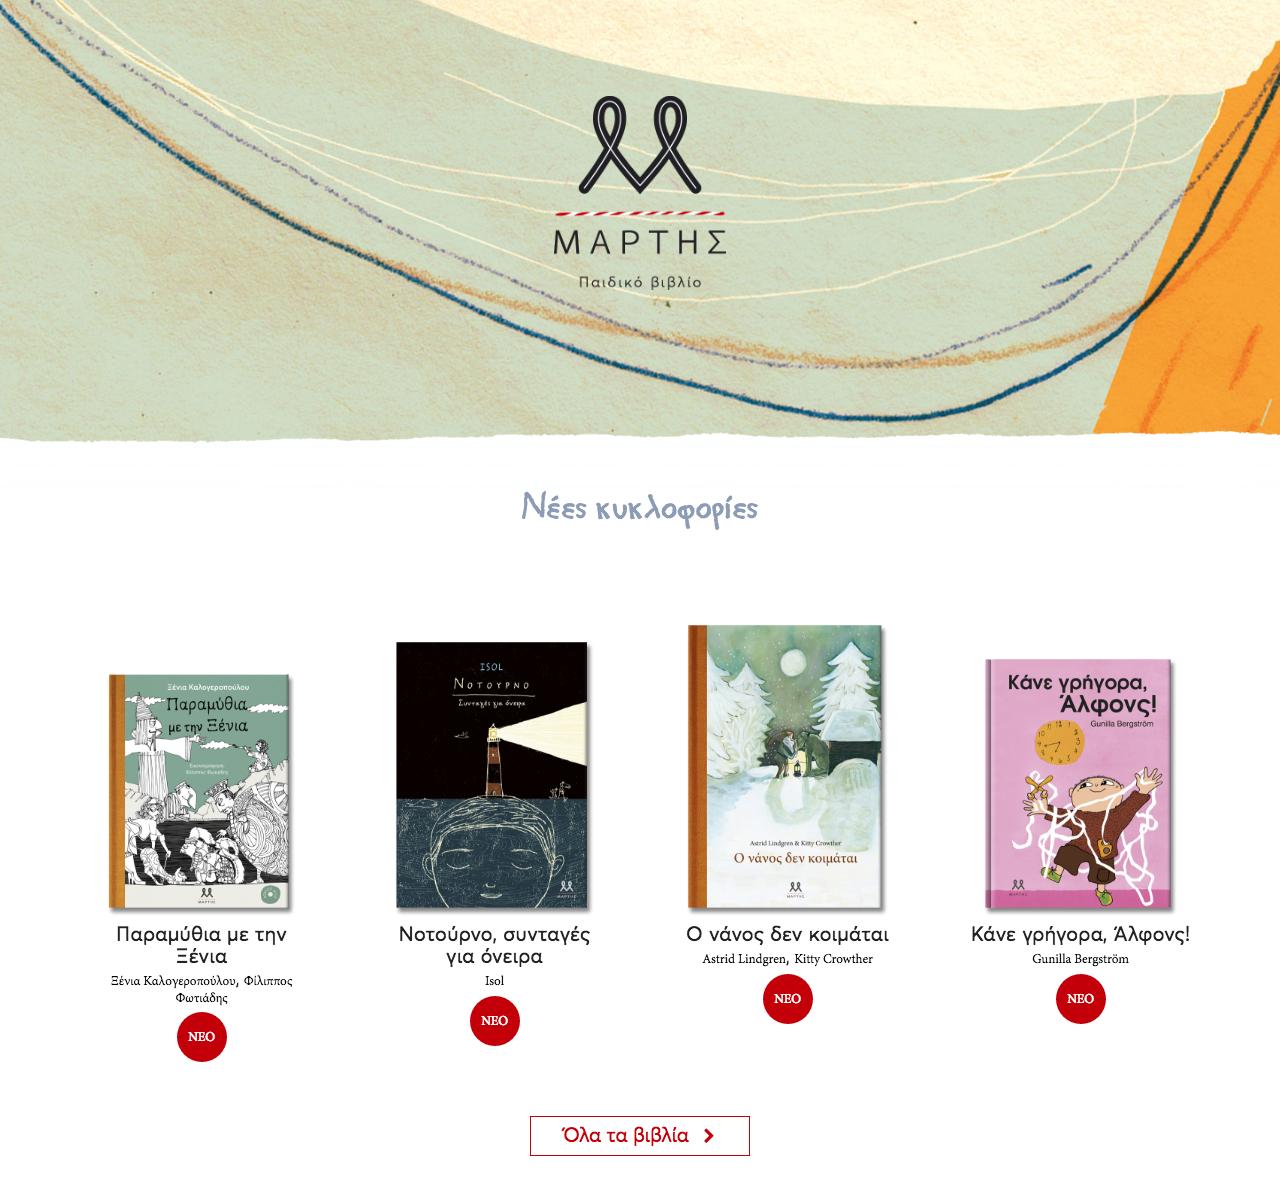 Martis Books